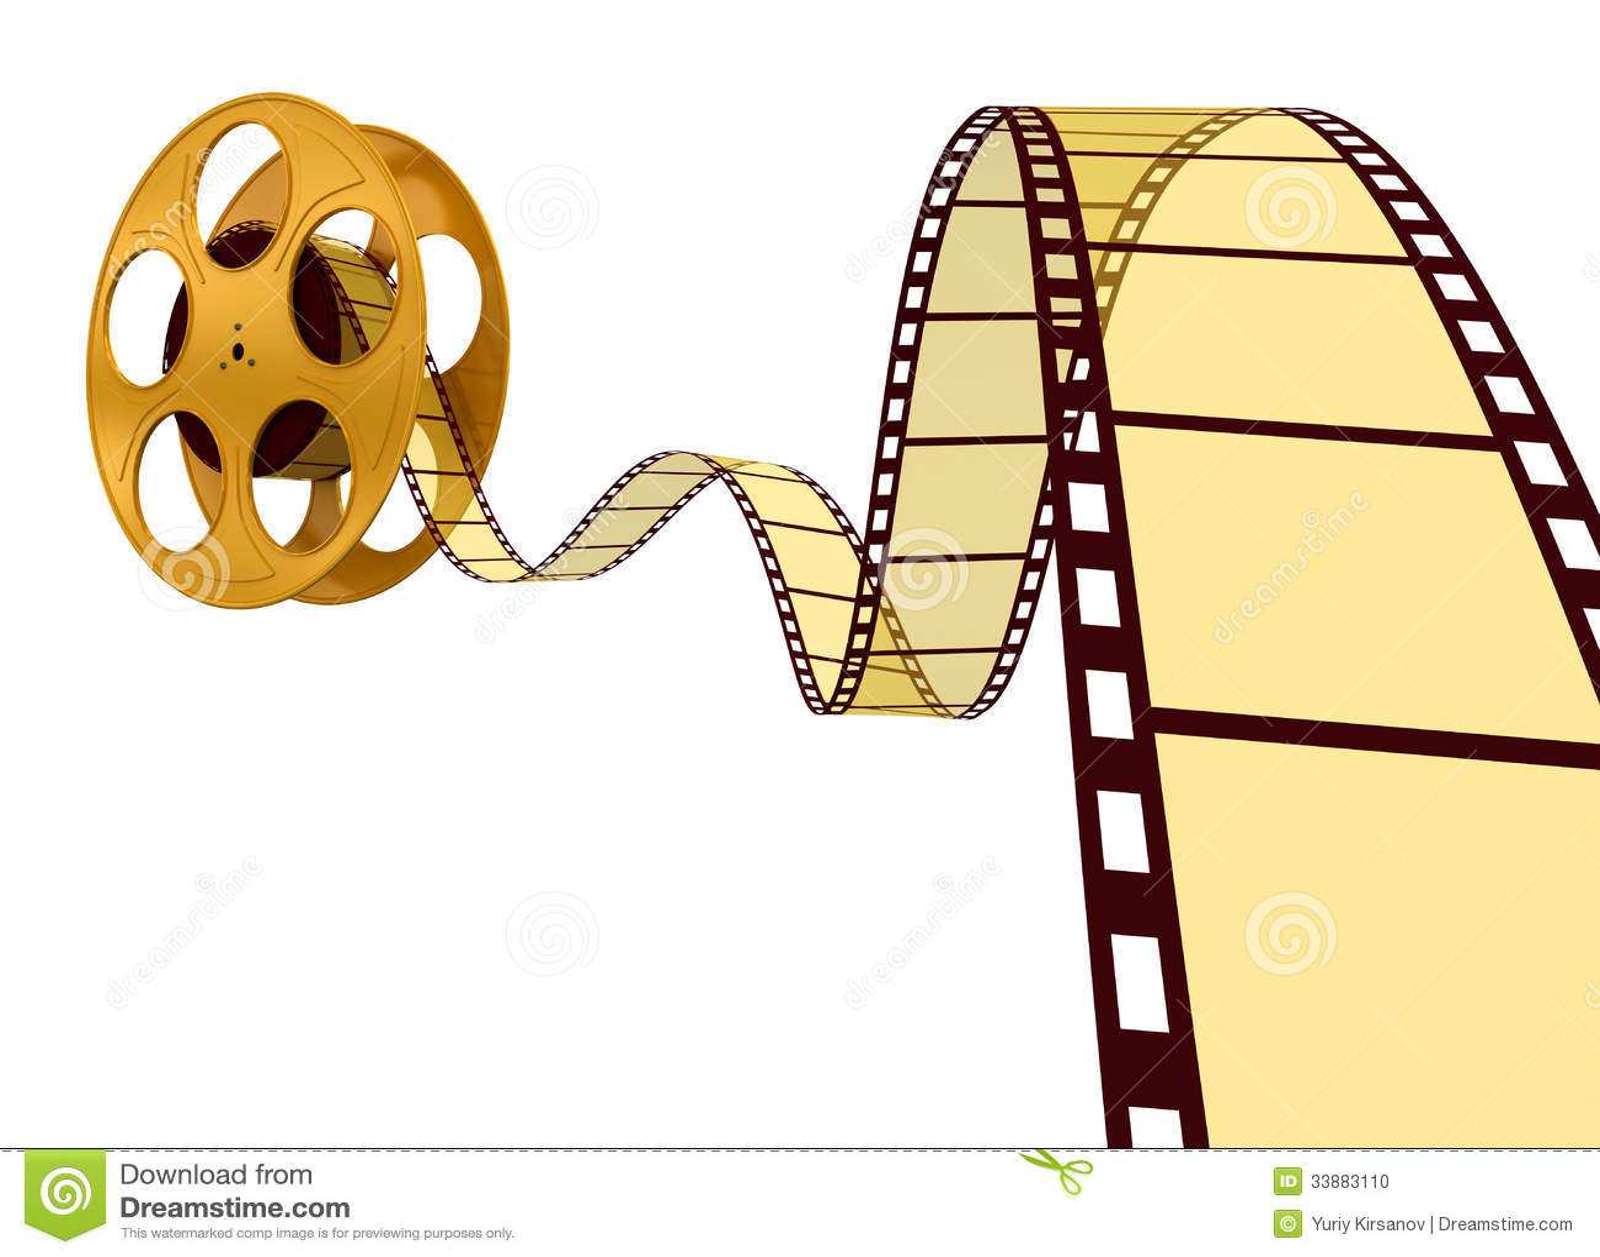 Gold Film Strip Stock Photo - Image: 33883110